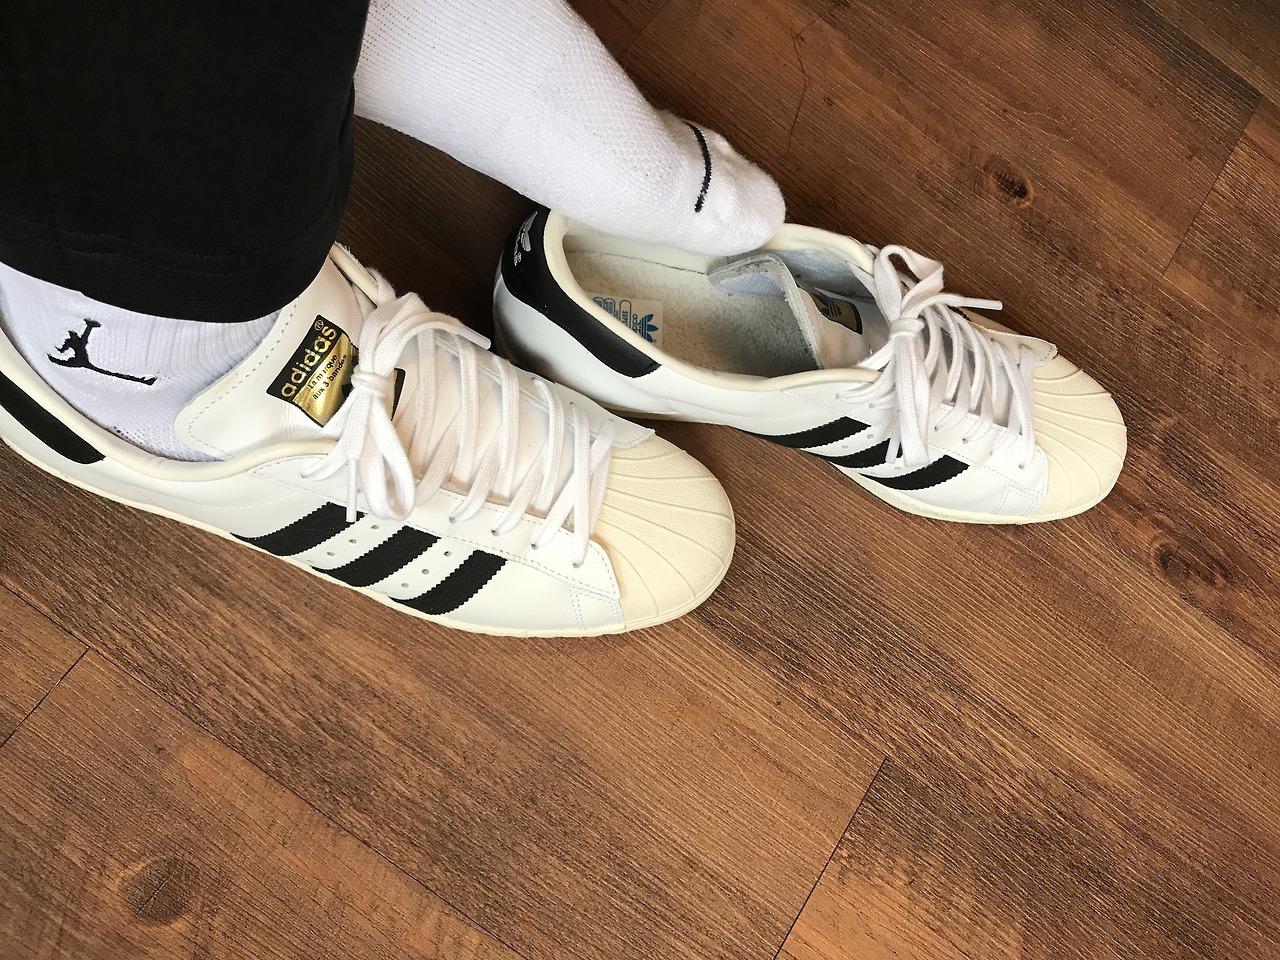 #鞋襪控 #歡迎交流#給我你的line ID #TOP — adidas superstar